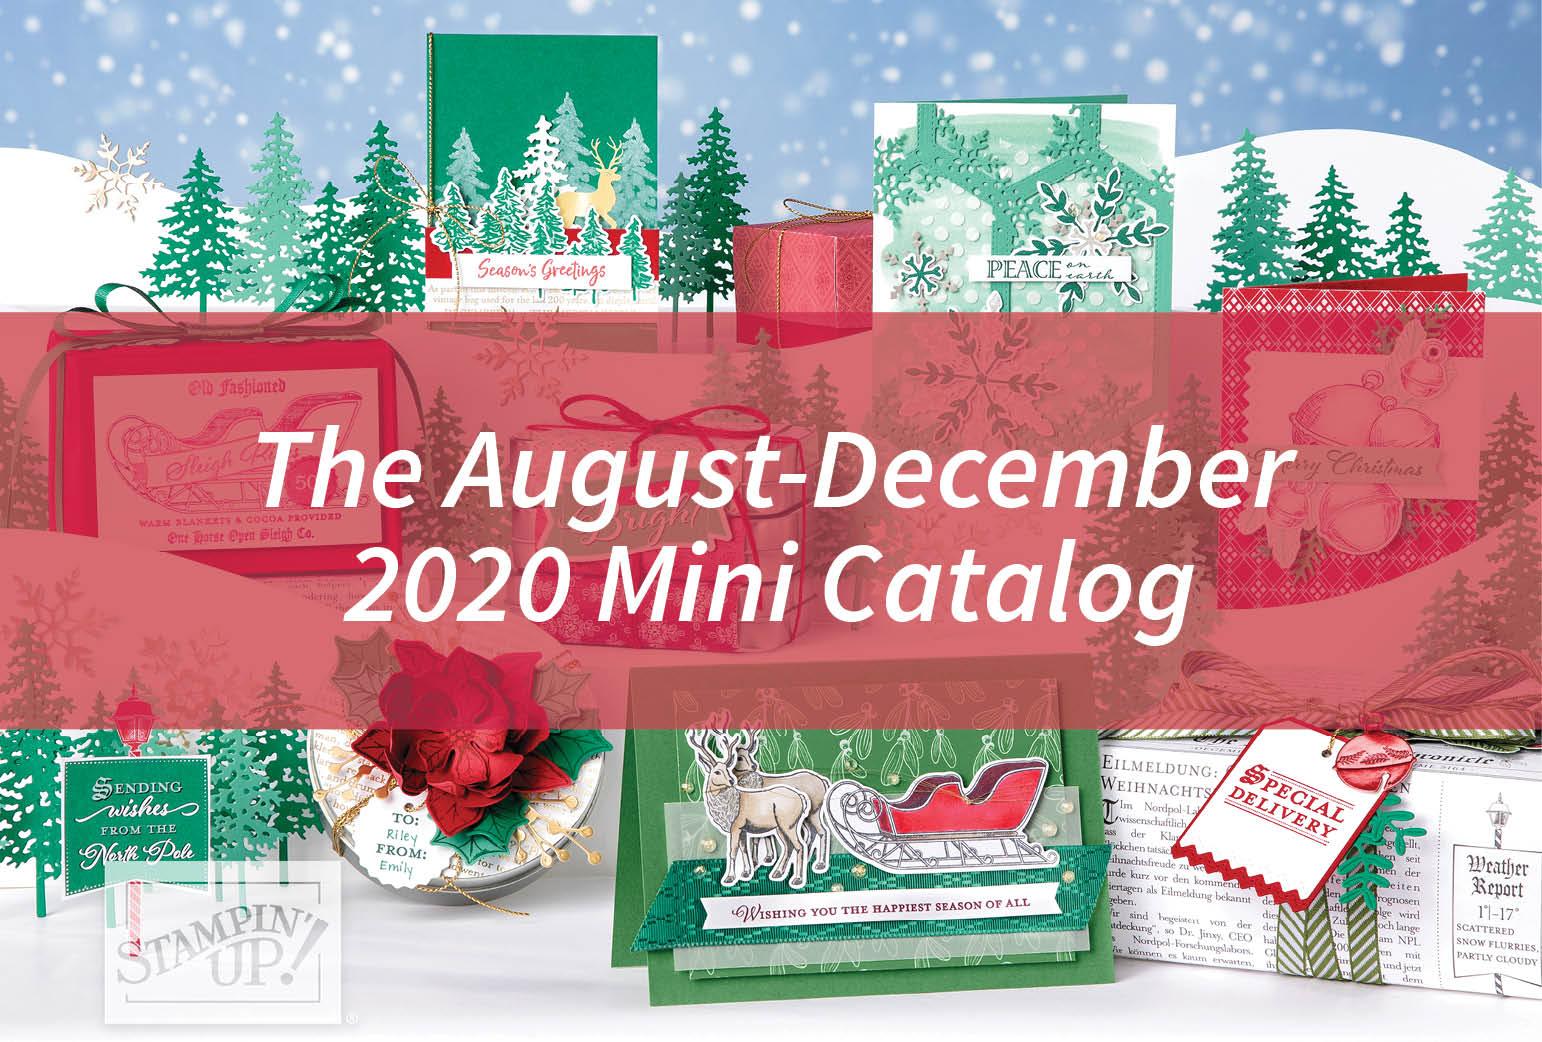 The August-December 2020 Mini Catalog